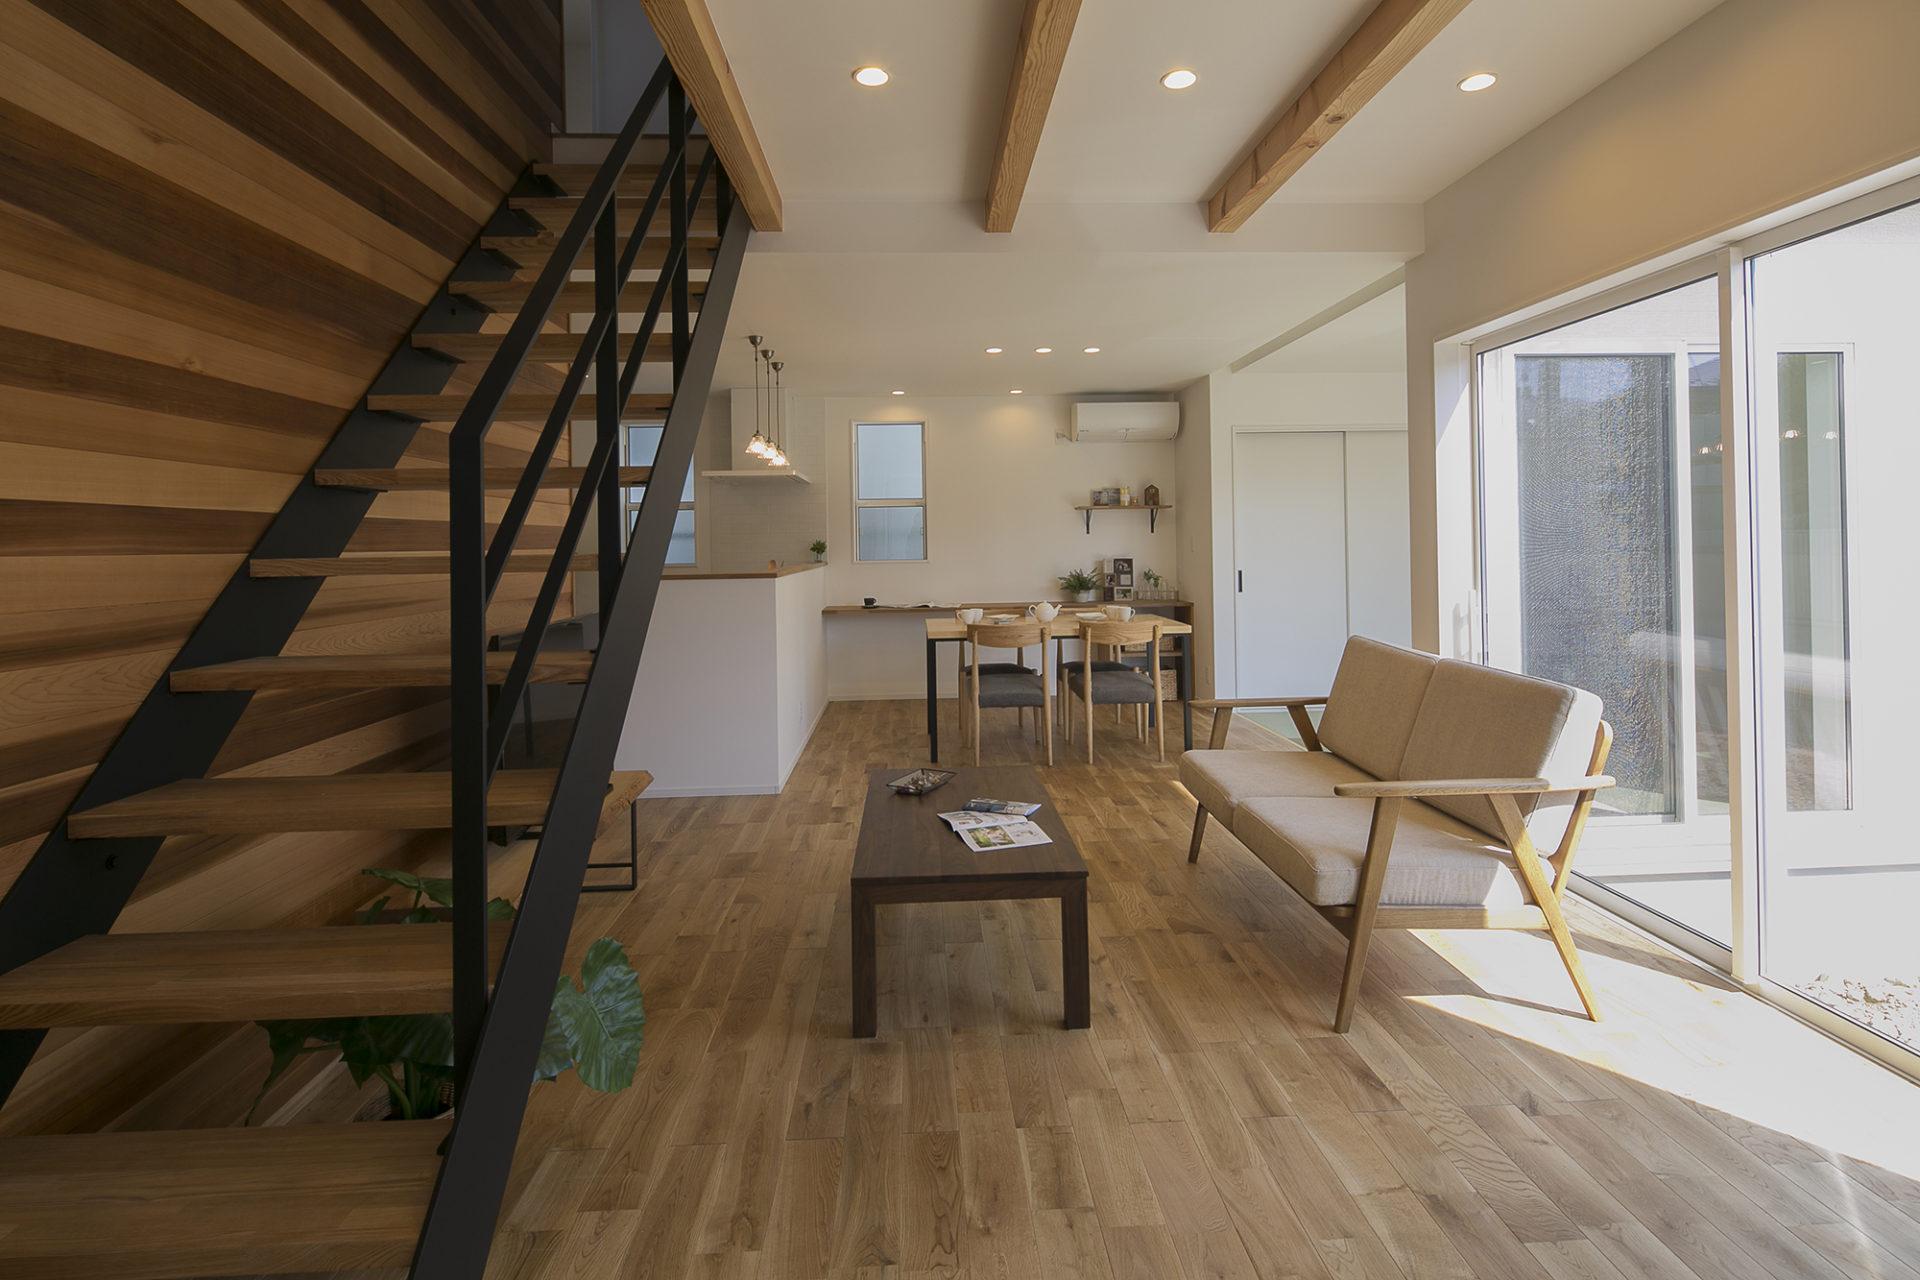 Shiawaseya-花と緑に囲まれながら ナチュラルな暮らしを愉しむ家